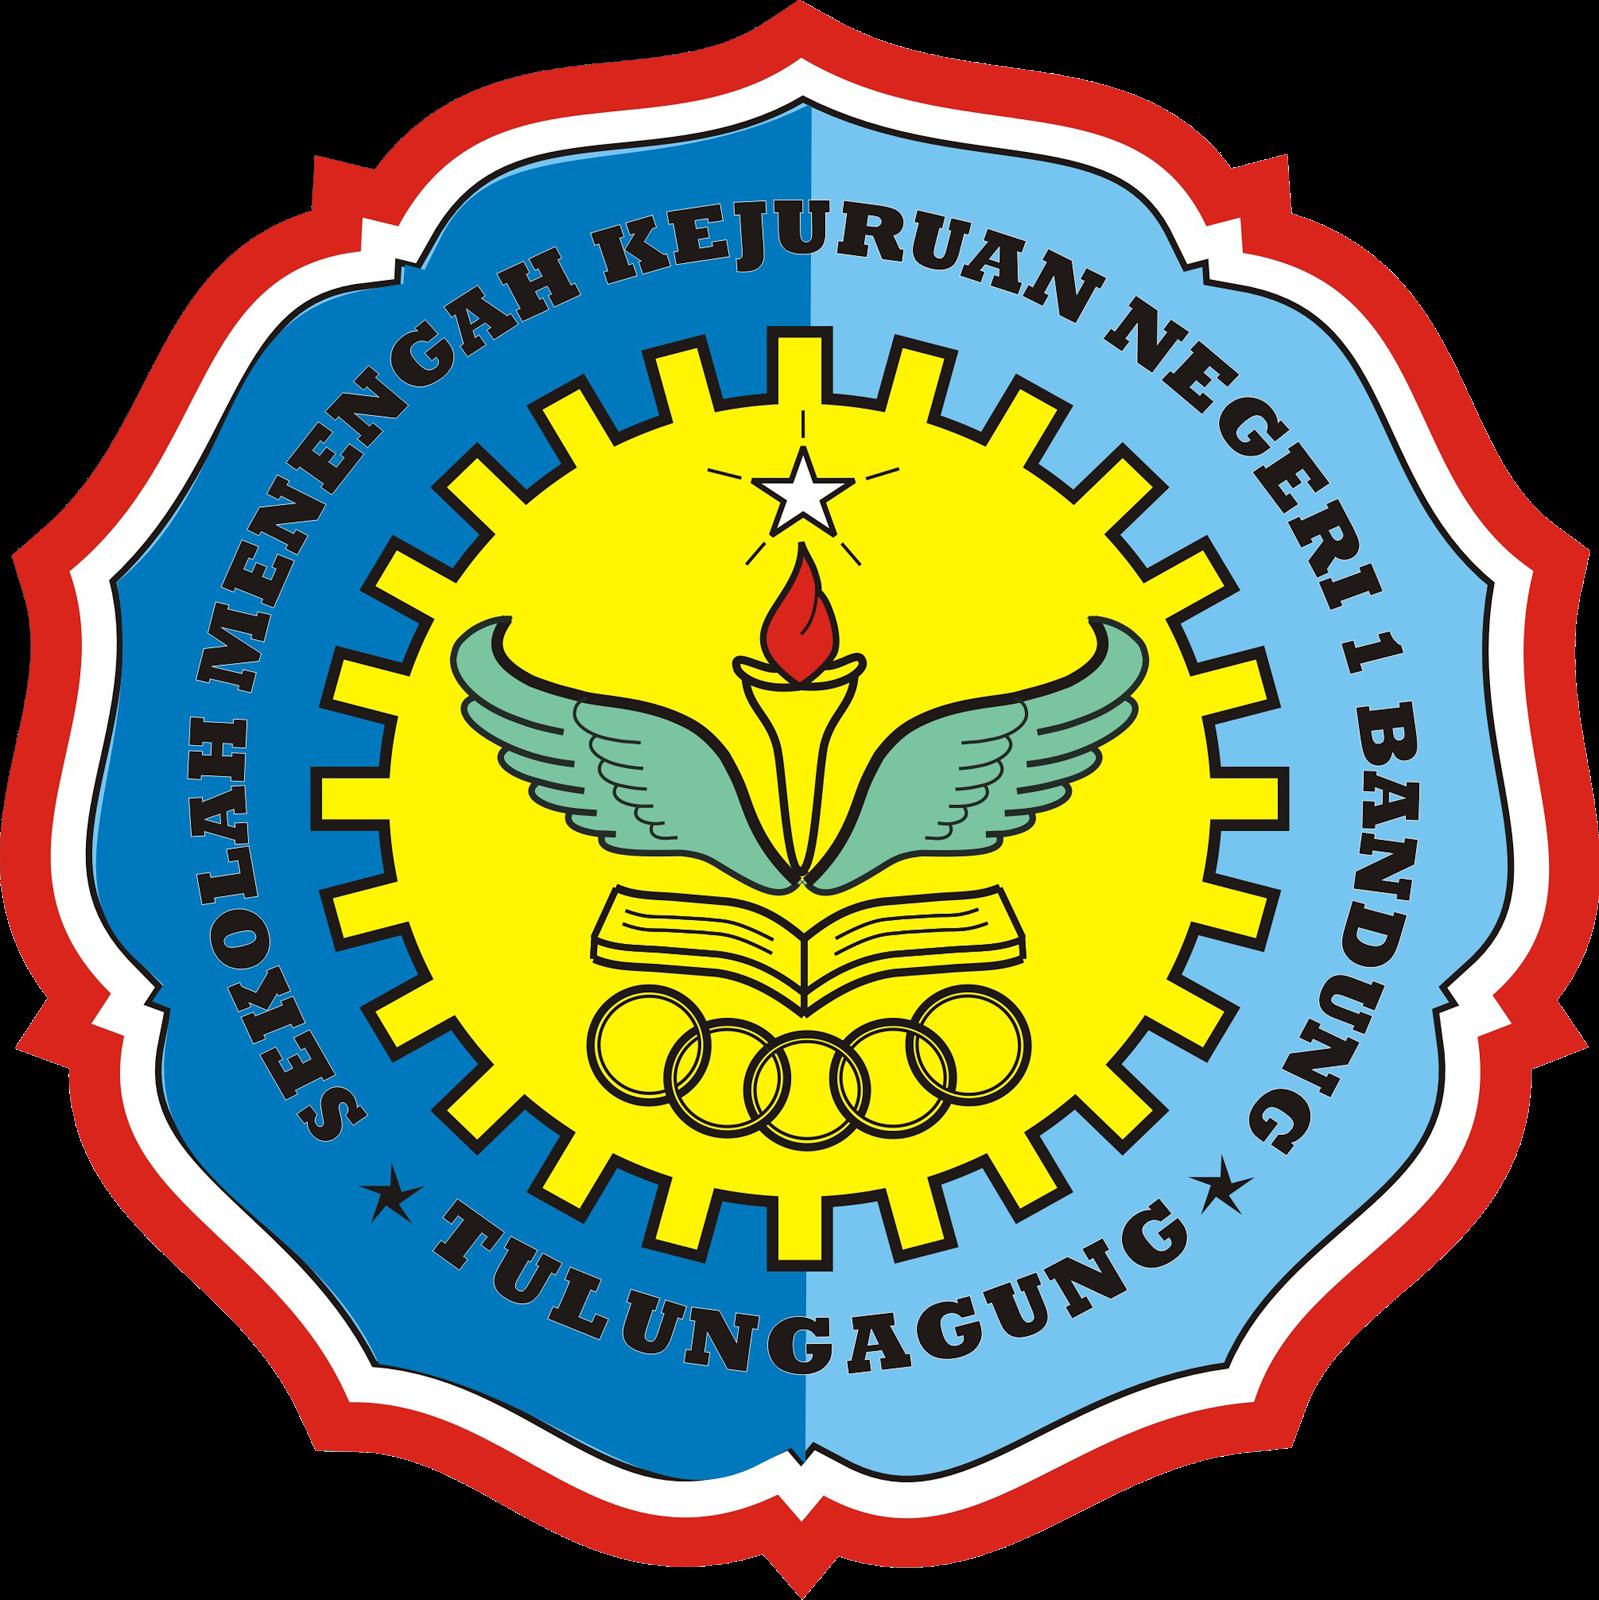 Logo SMKN 1 Bandung Tulungagung versi PNG besar (hanya logo saja, sekitar logo transparan)